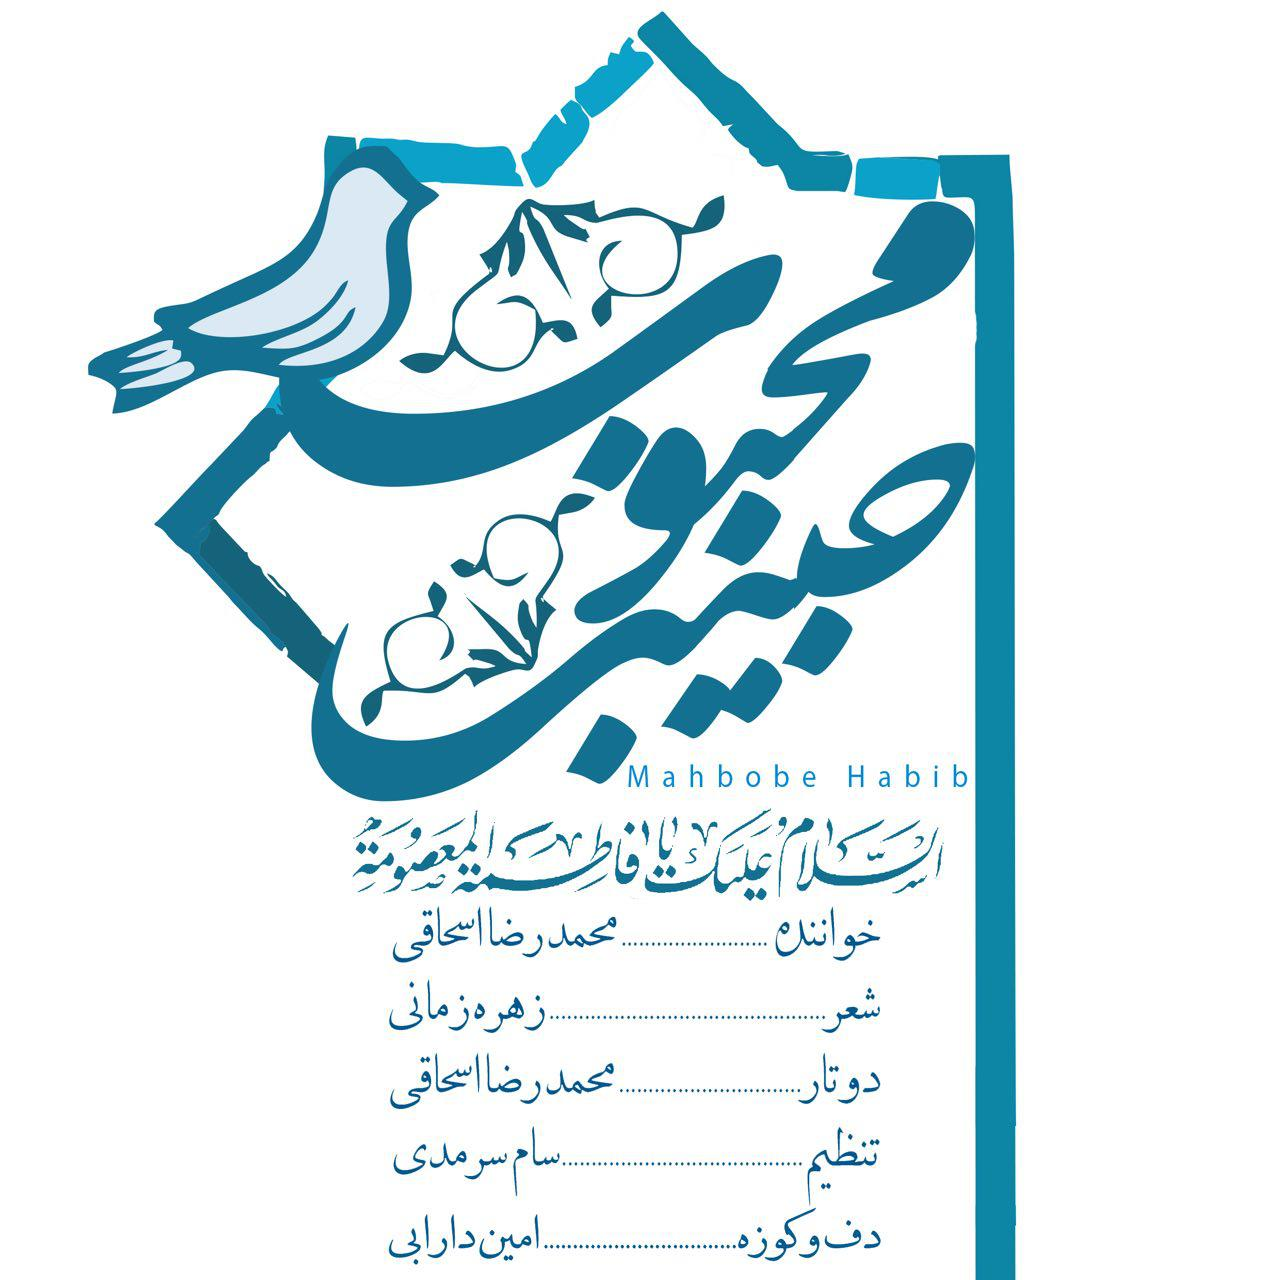 Mohammadreza Eshaghi – Mahbobe Habib